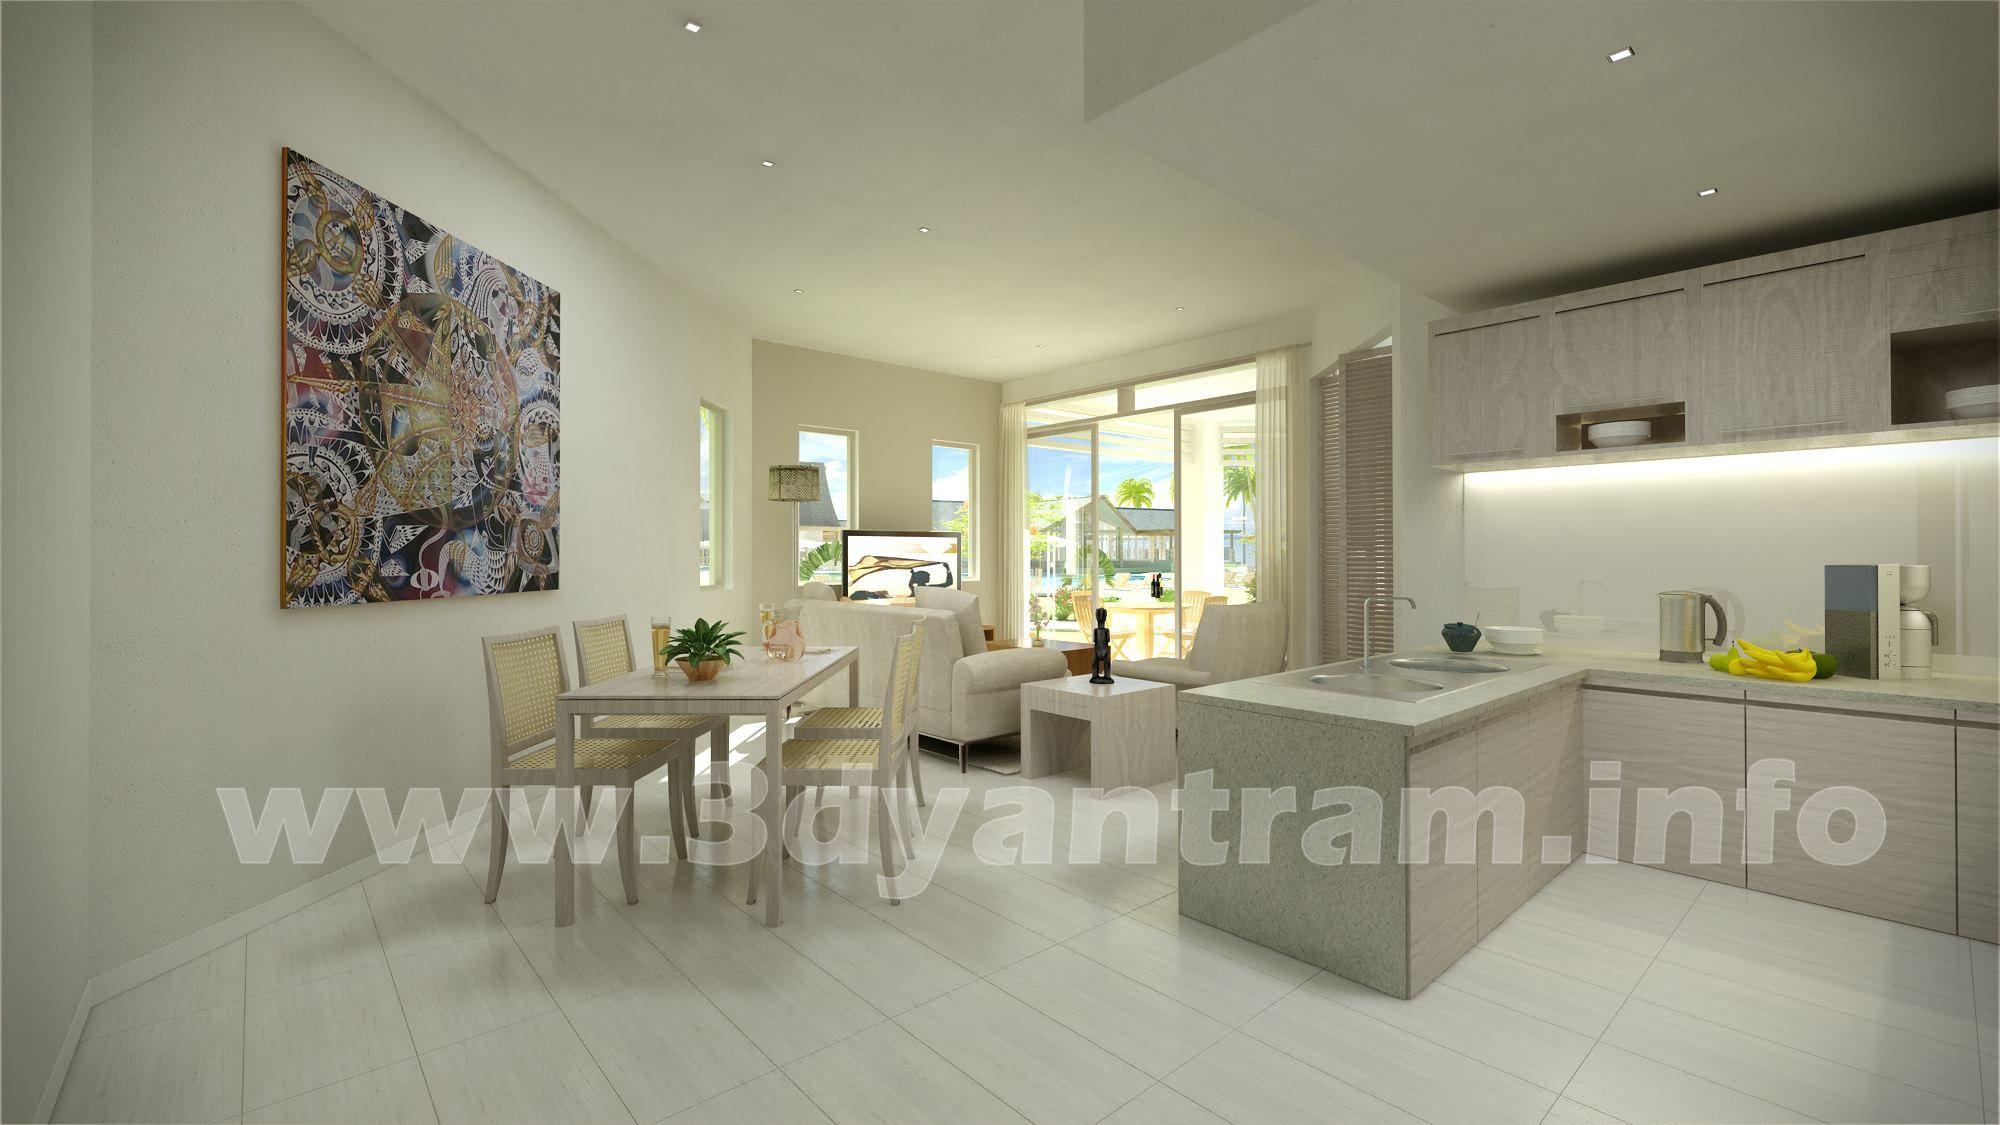 3d interior residencial cgi cocina diseño | Diseño de interiores ...